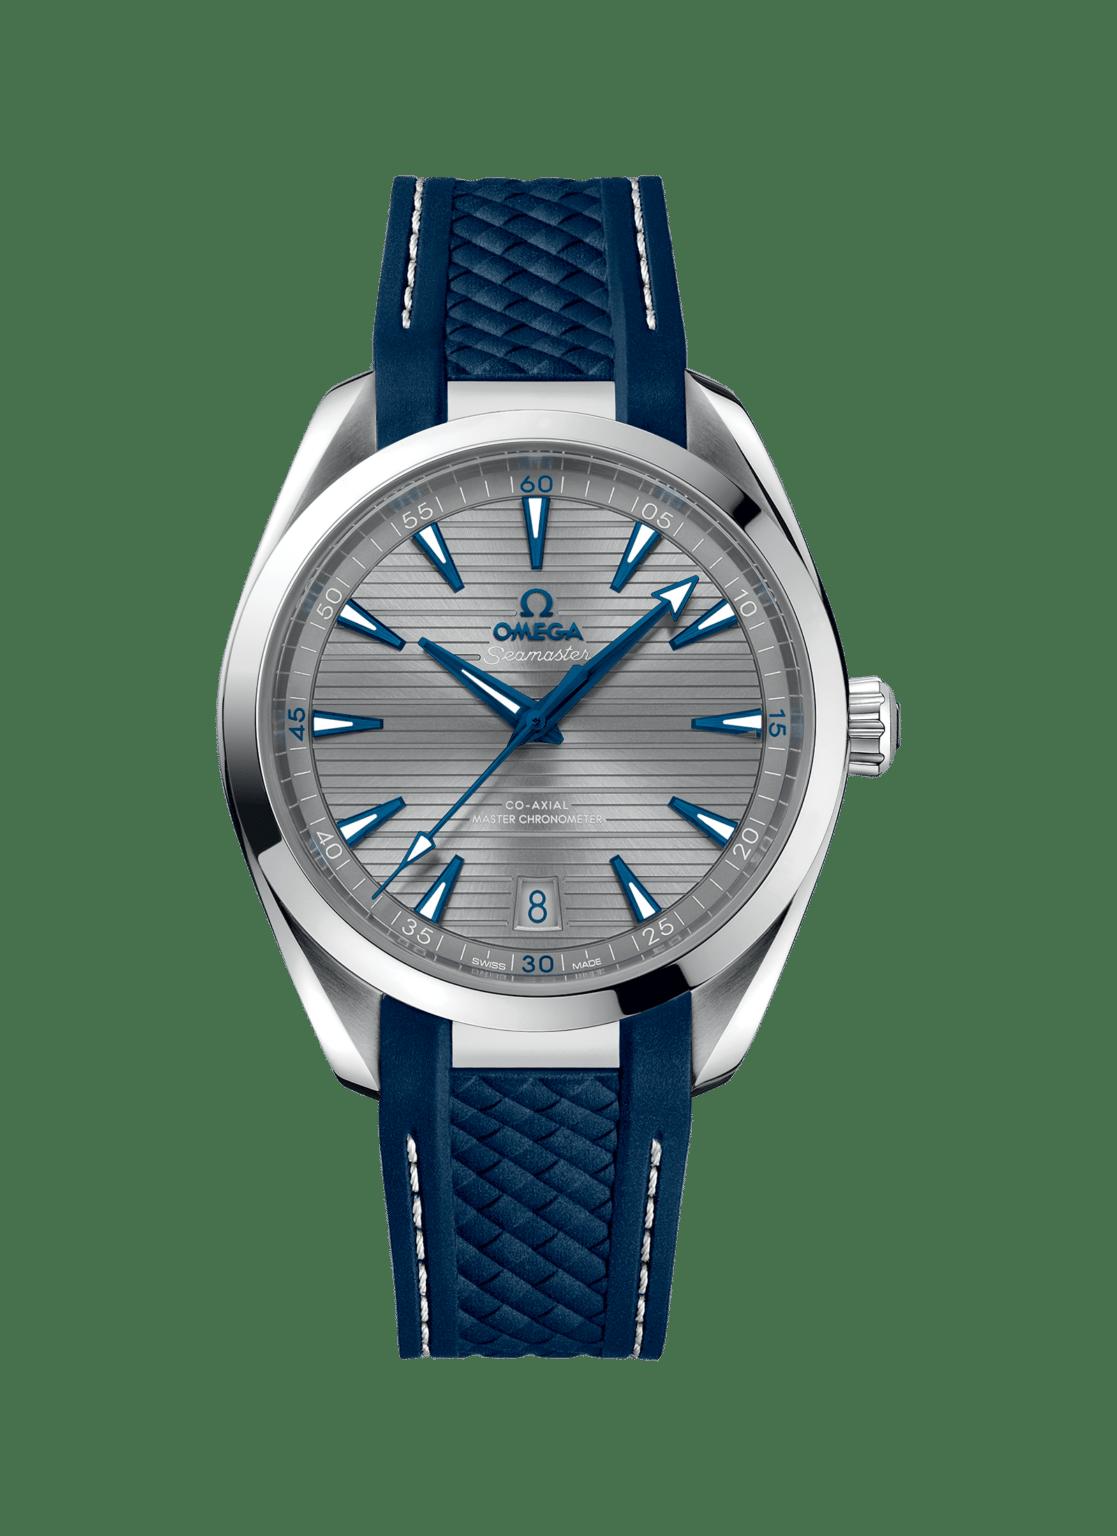 Omega – Seamaster – Aqua Terra 150 M Co‑Axial Master Chronometer 41 mm - Wagner Bijouterie Uhren